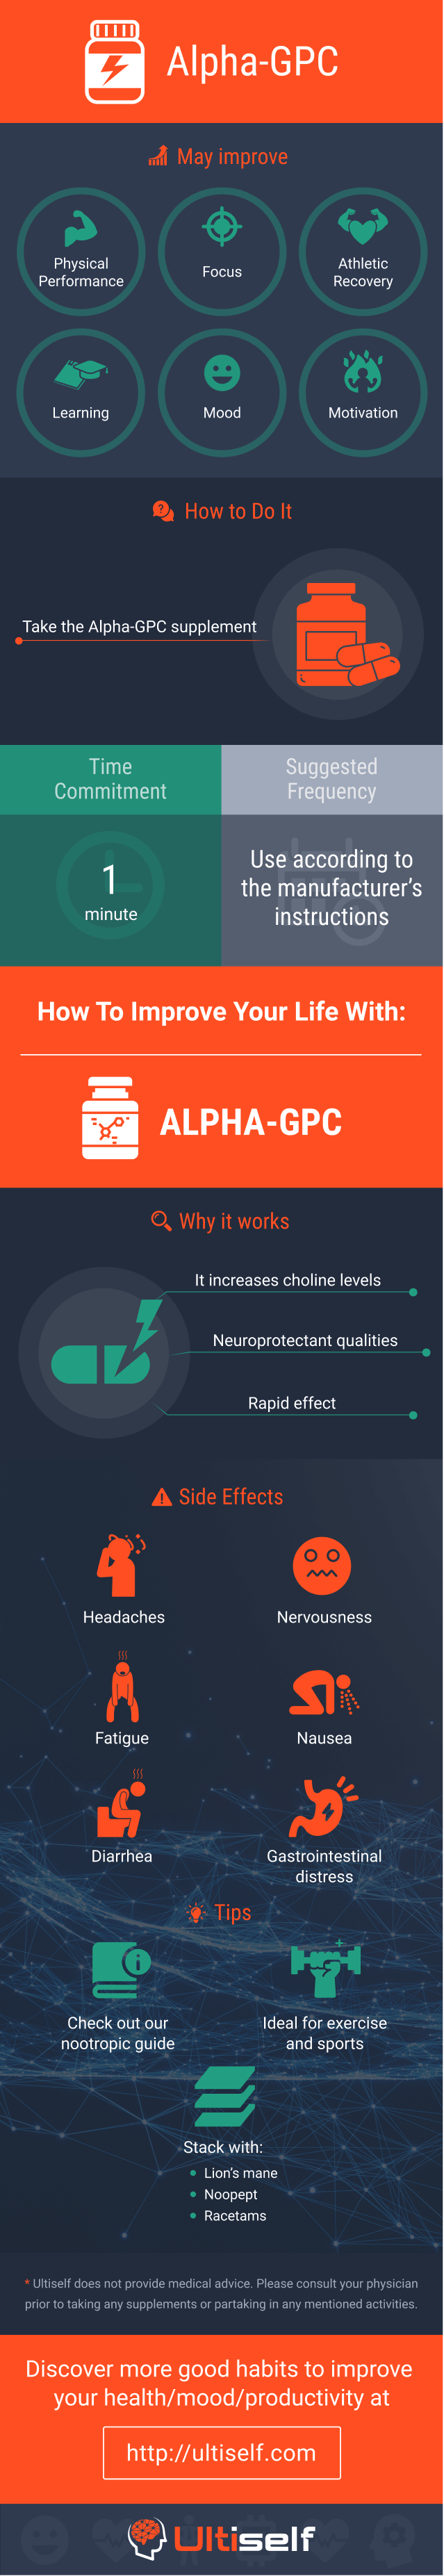 Alpha-GPC infographic